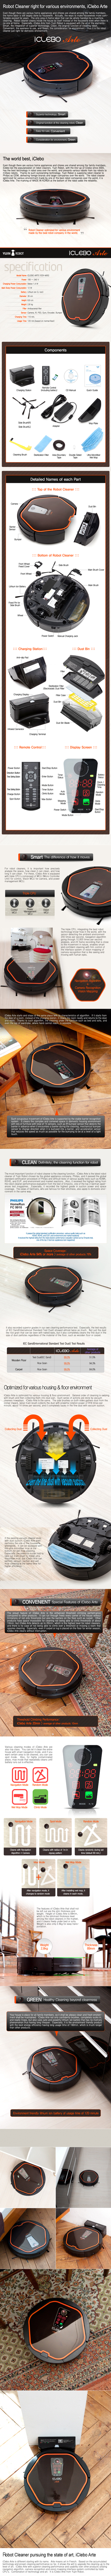 YUJIN ROBOT iClebo Arte YCR-M05-10